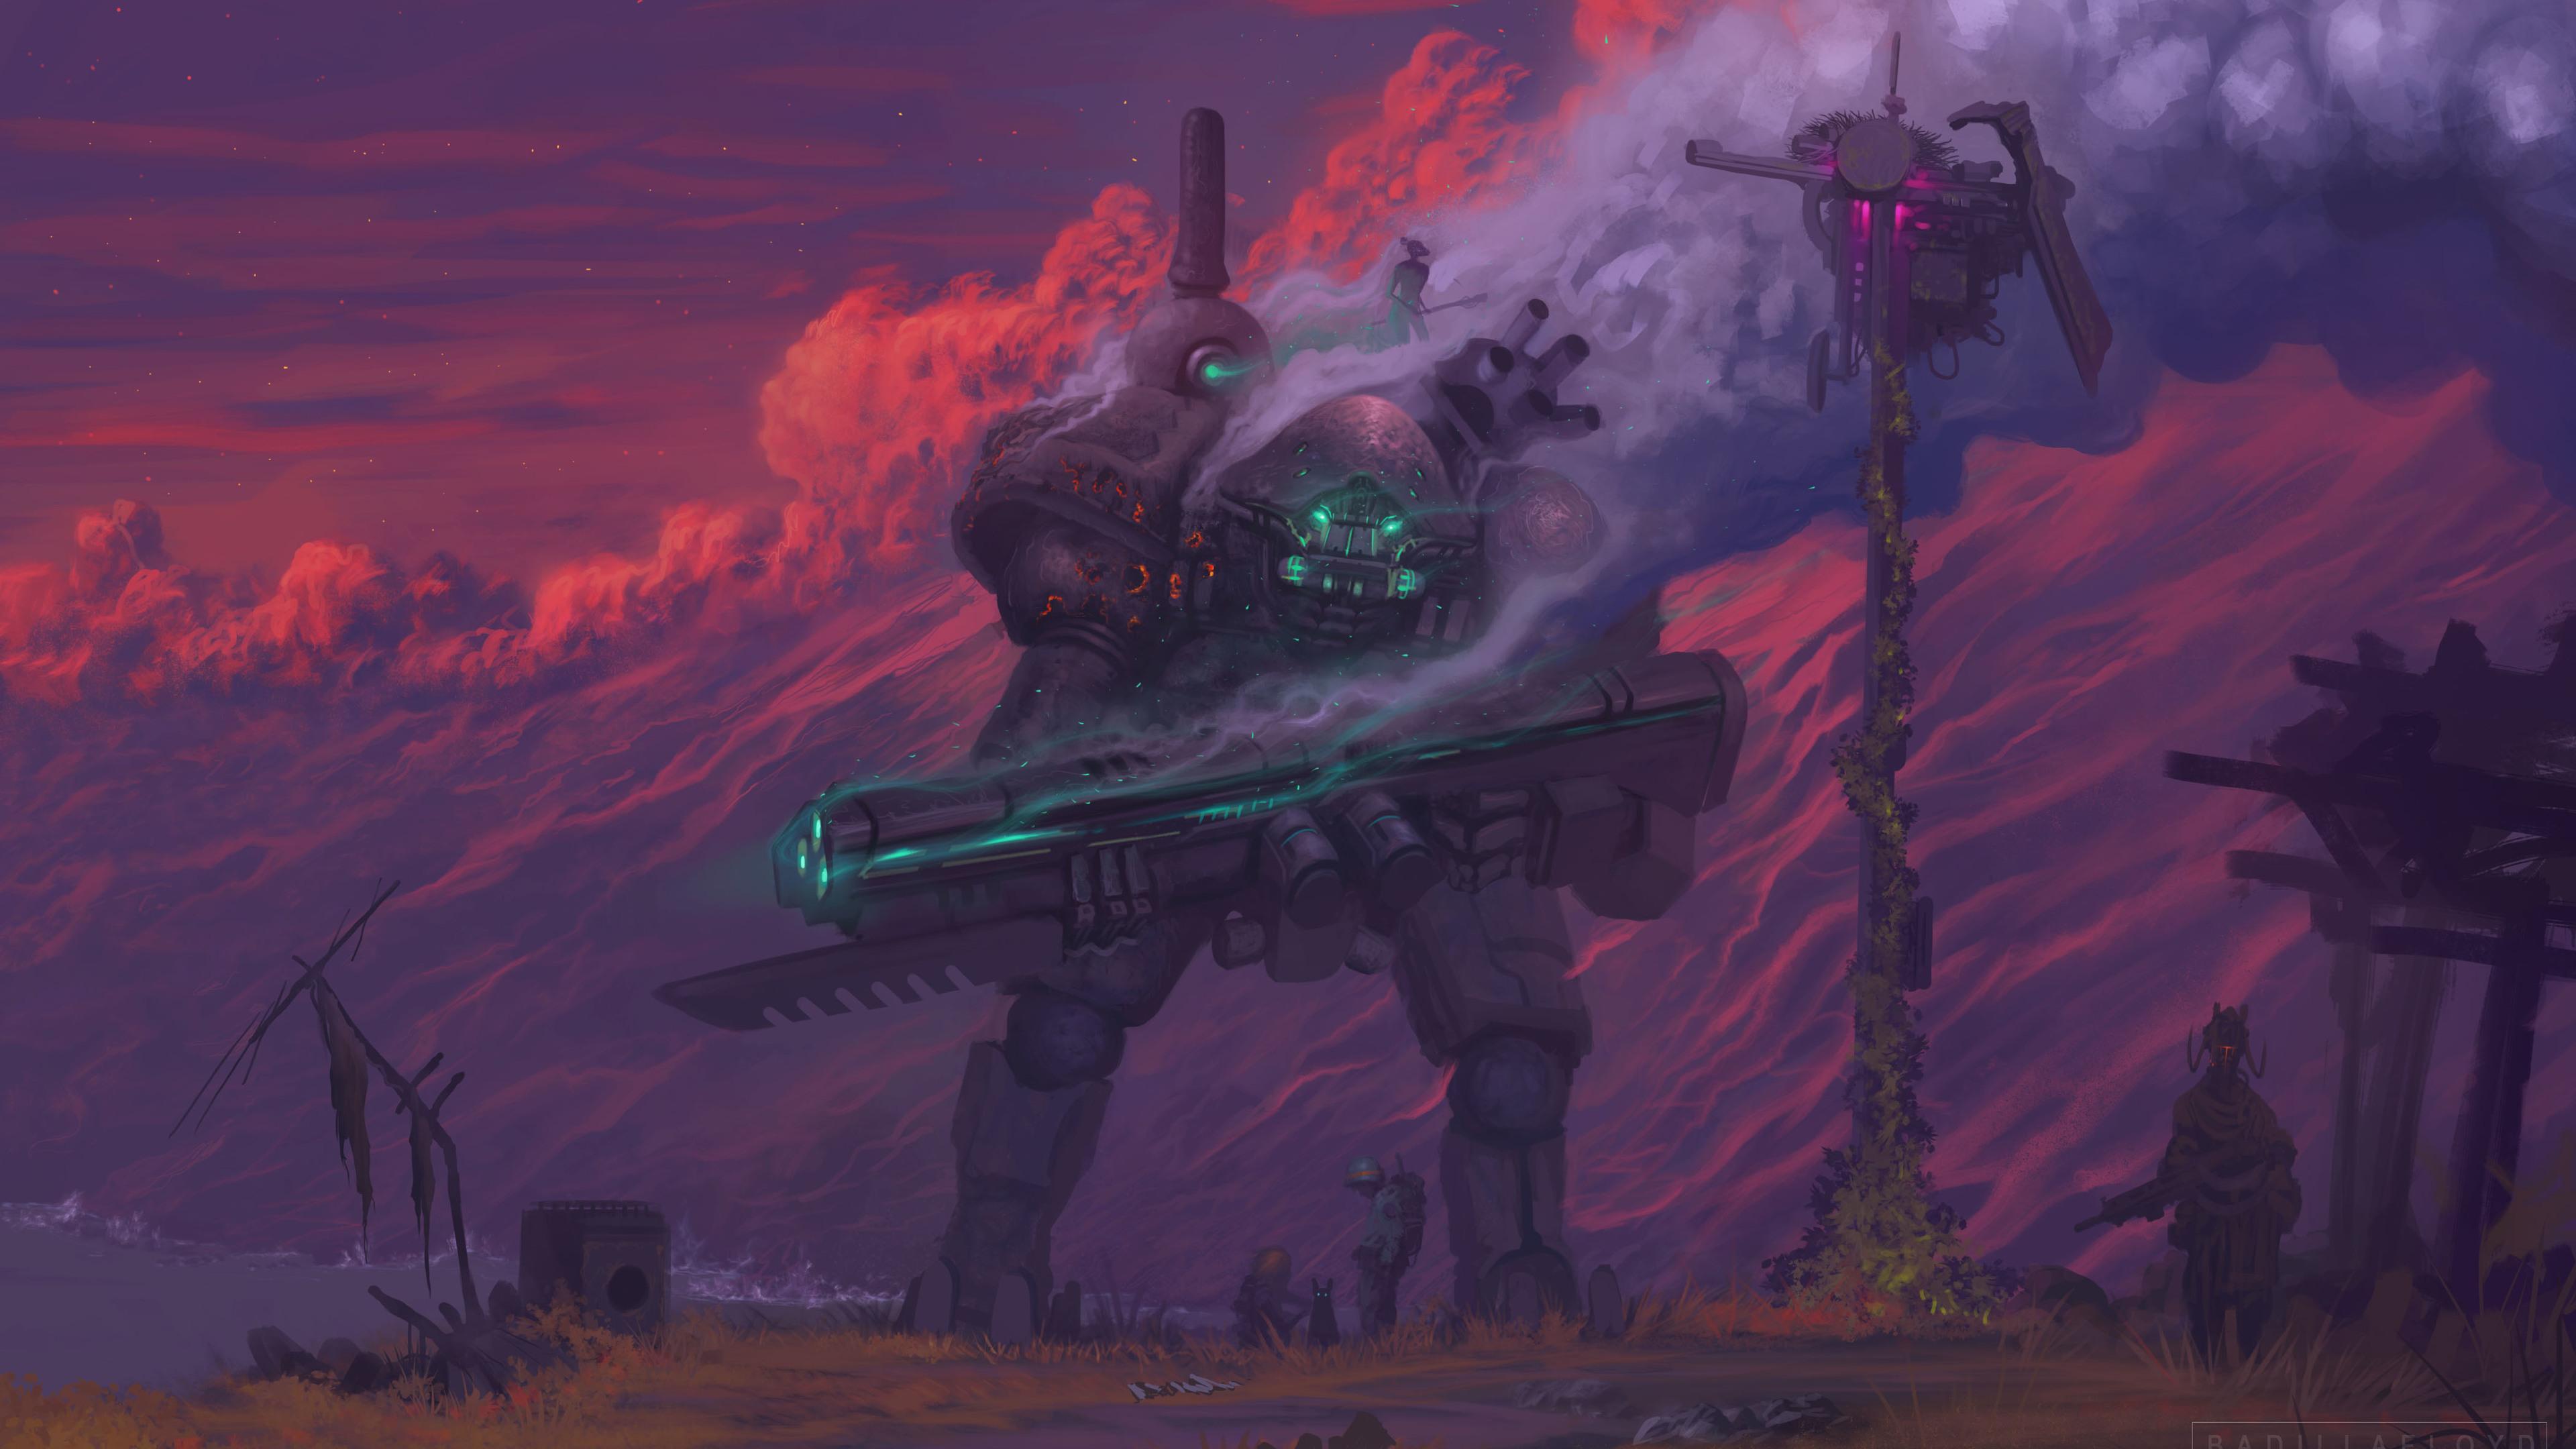 scifi robot digital art painting 4k 1540756208